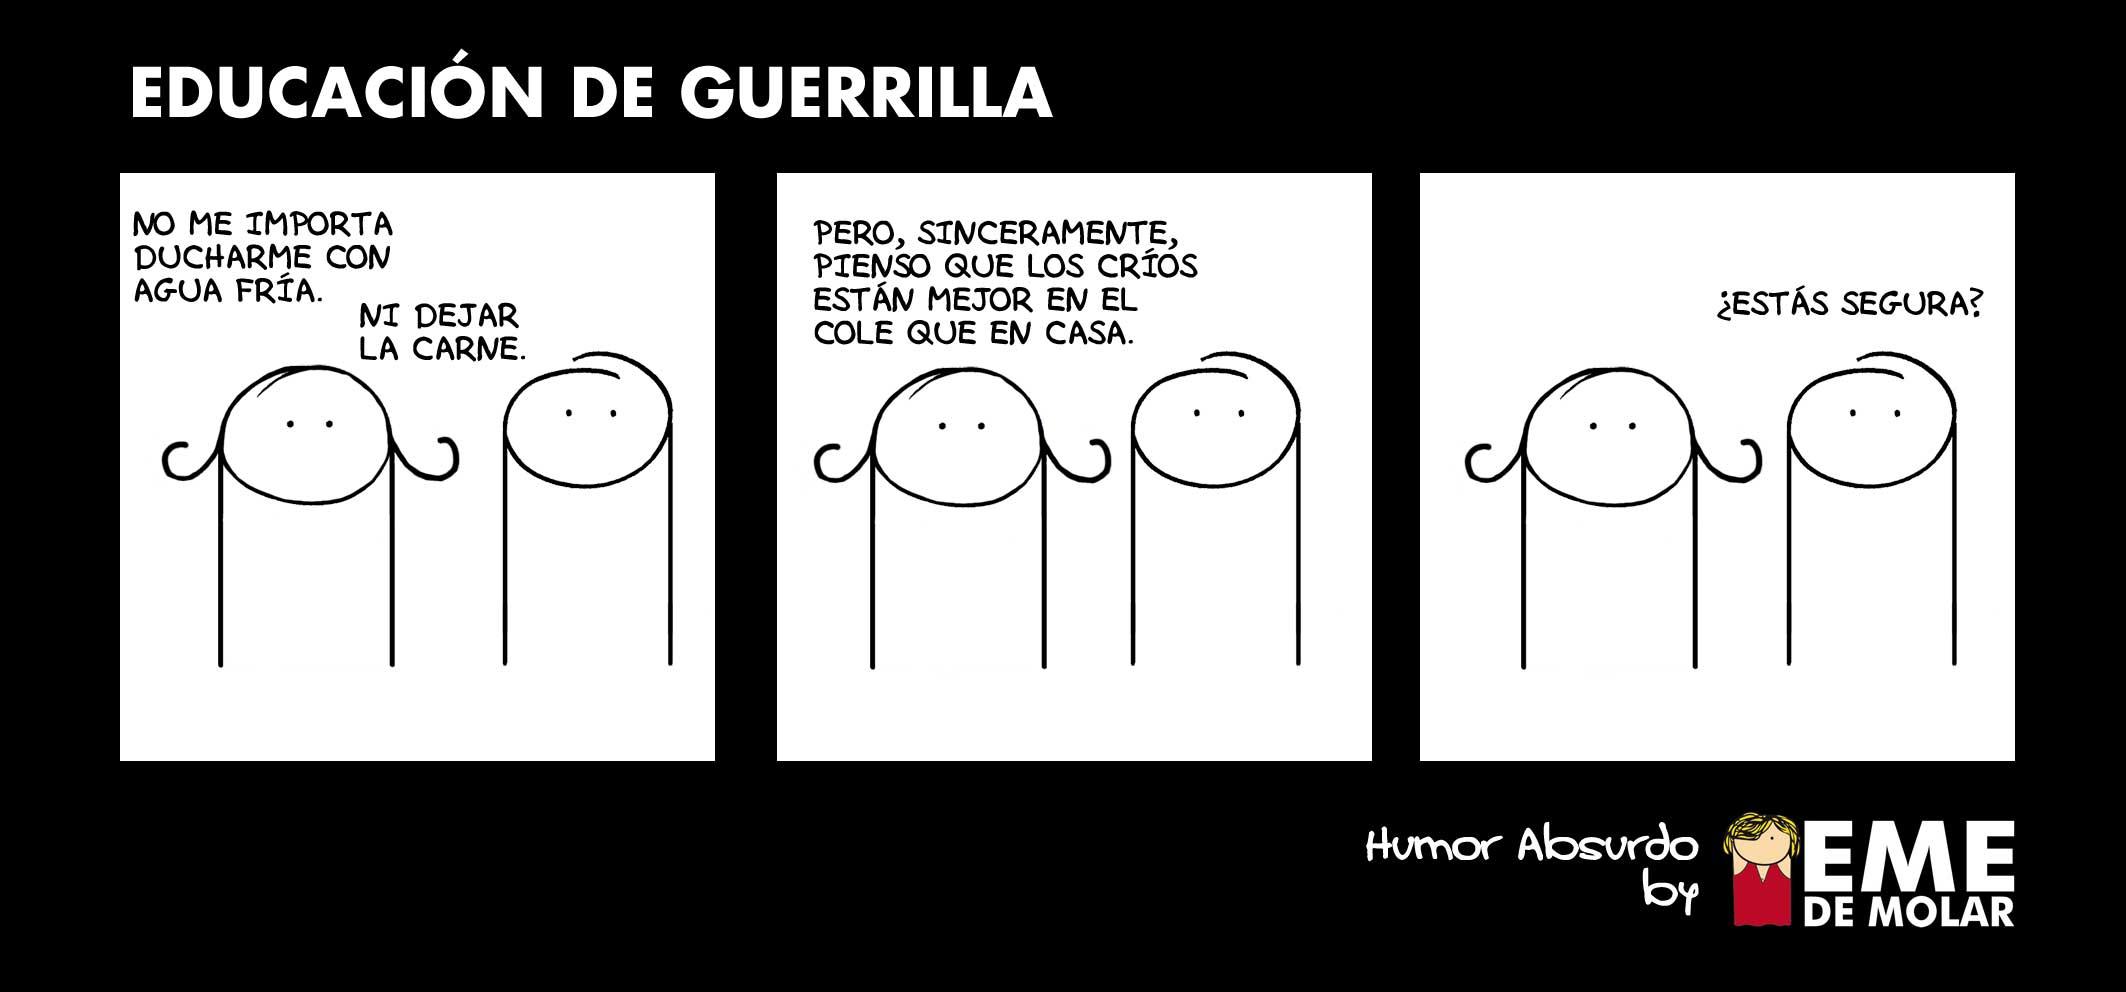 CRISIS-EDUCACION-GUERRILLA